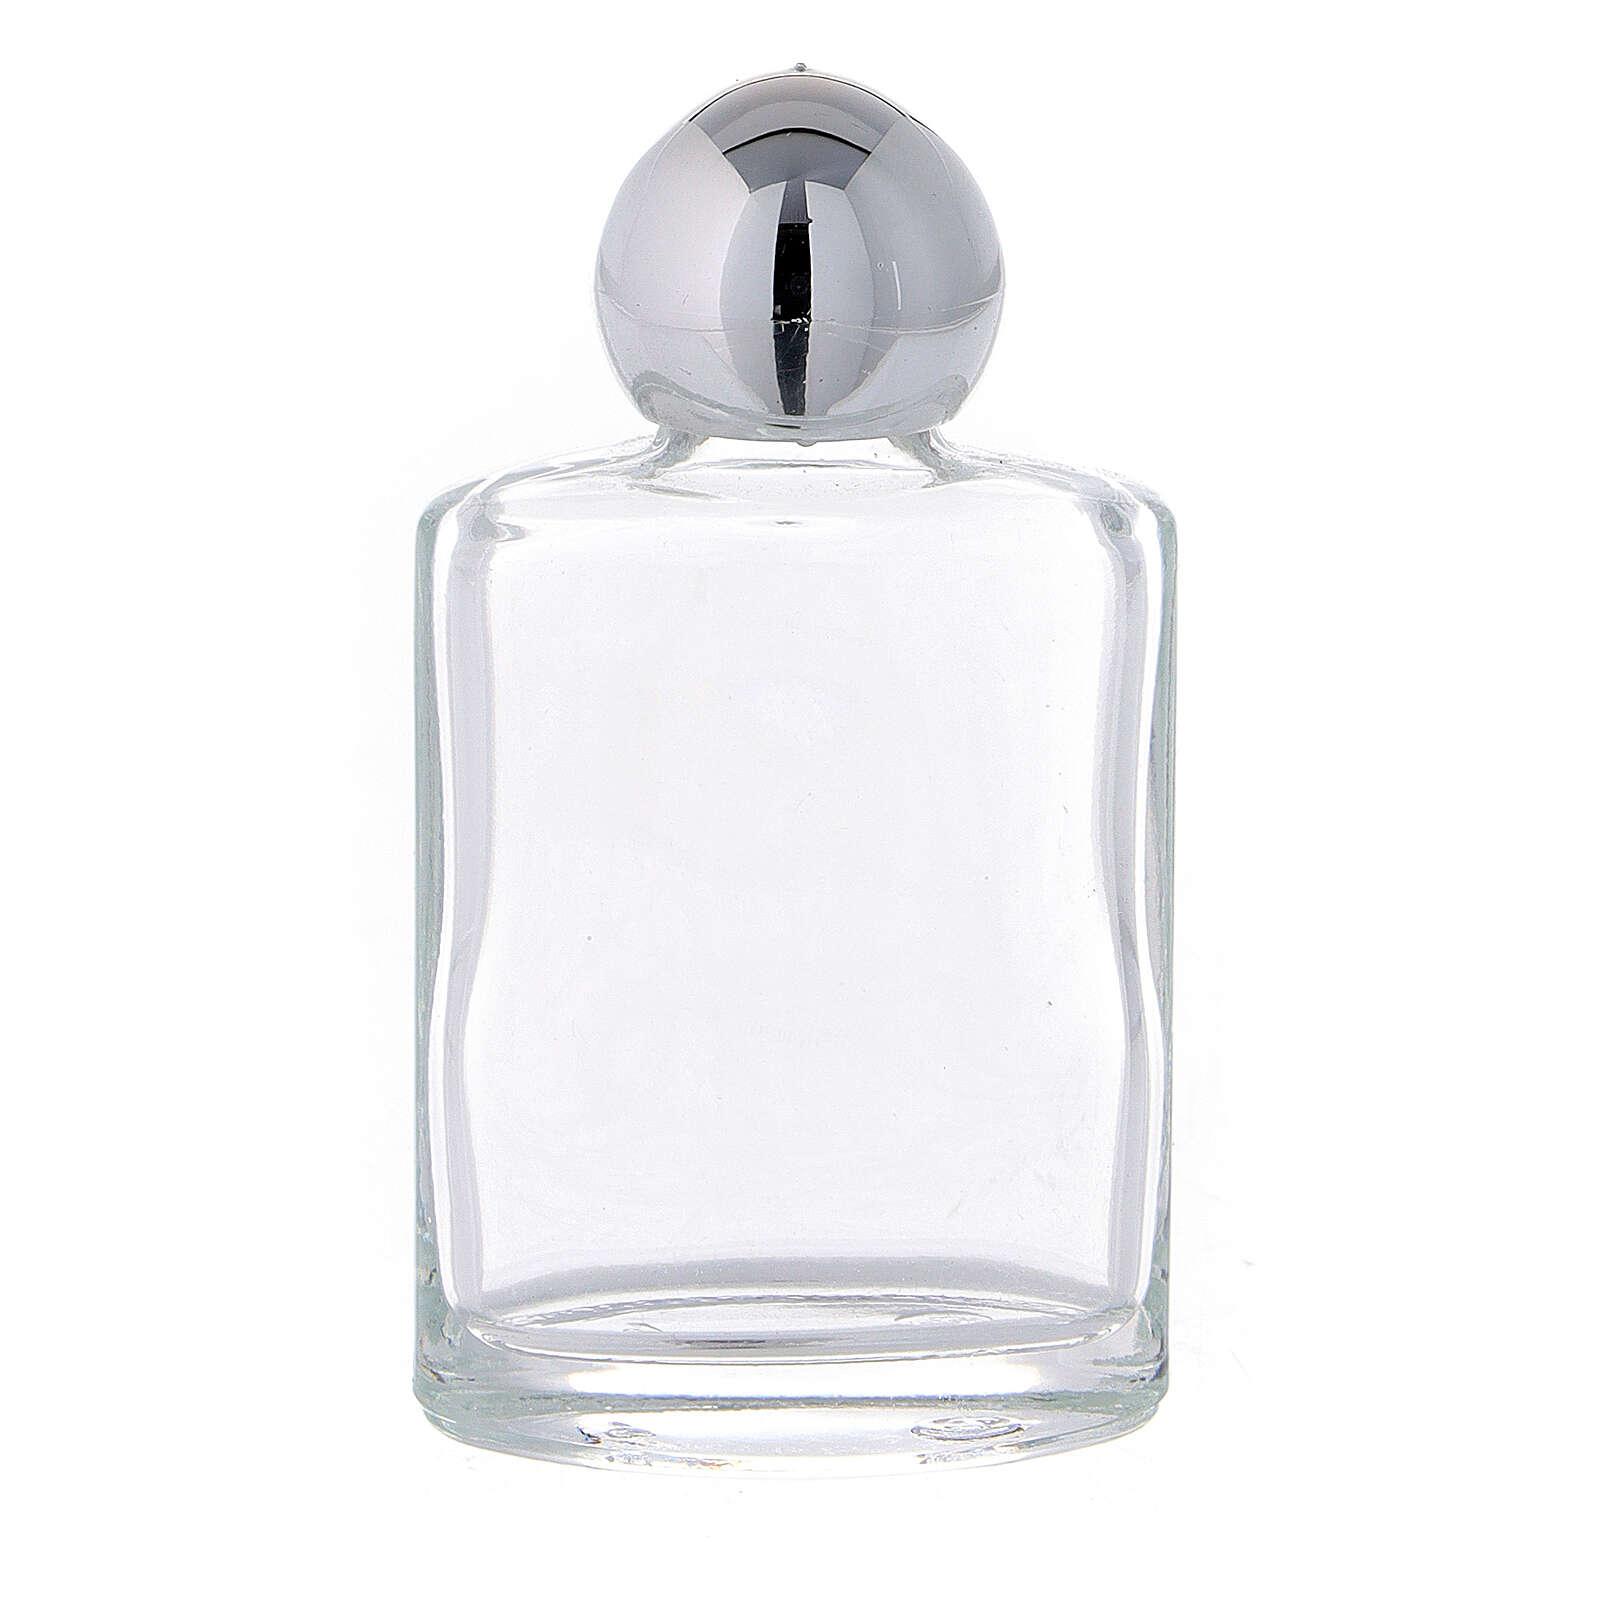 Botella agua bendita 15 ml de vidrio (CAJA 50 PIEZAS) 3